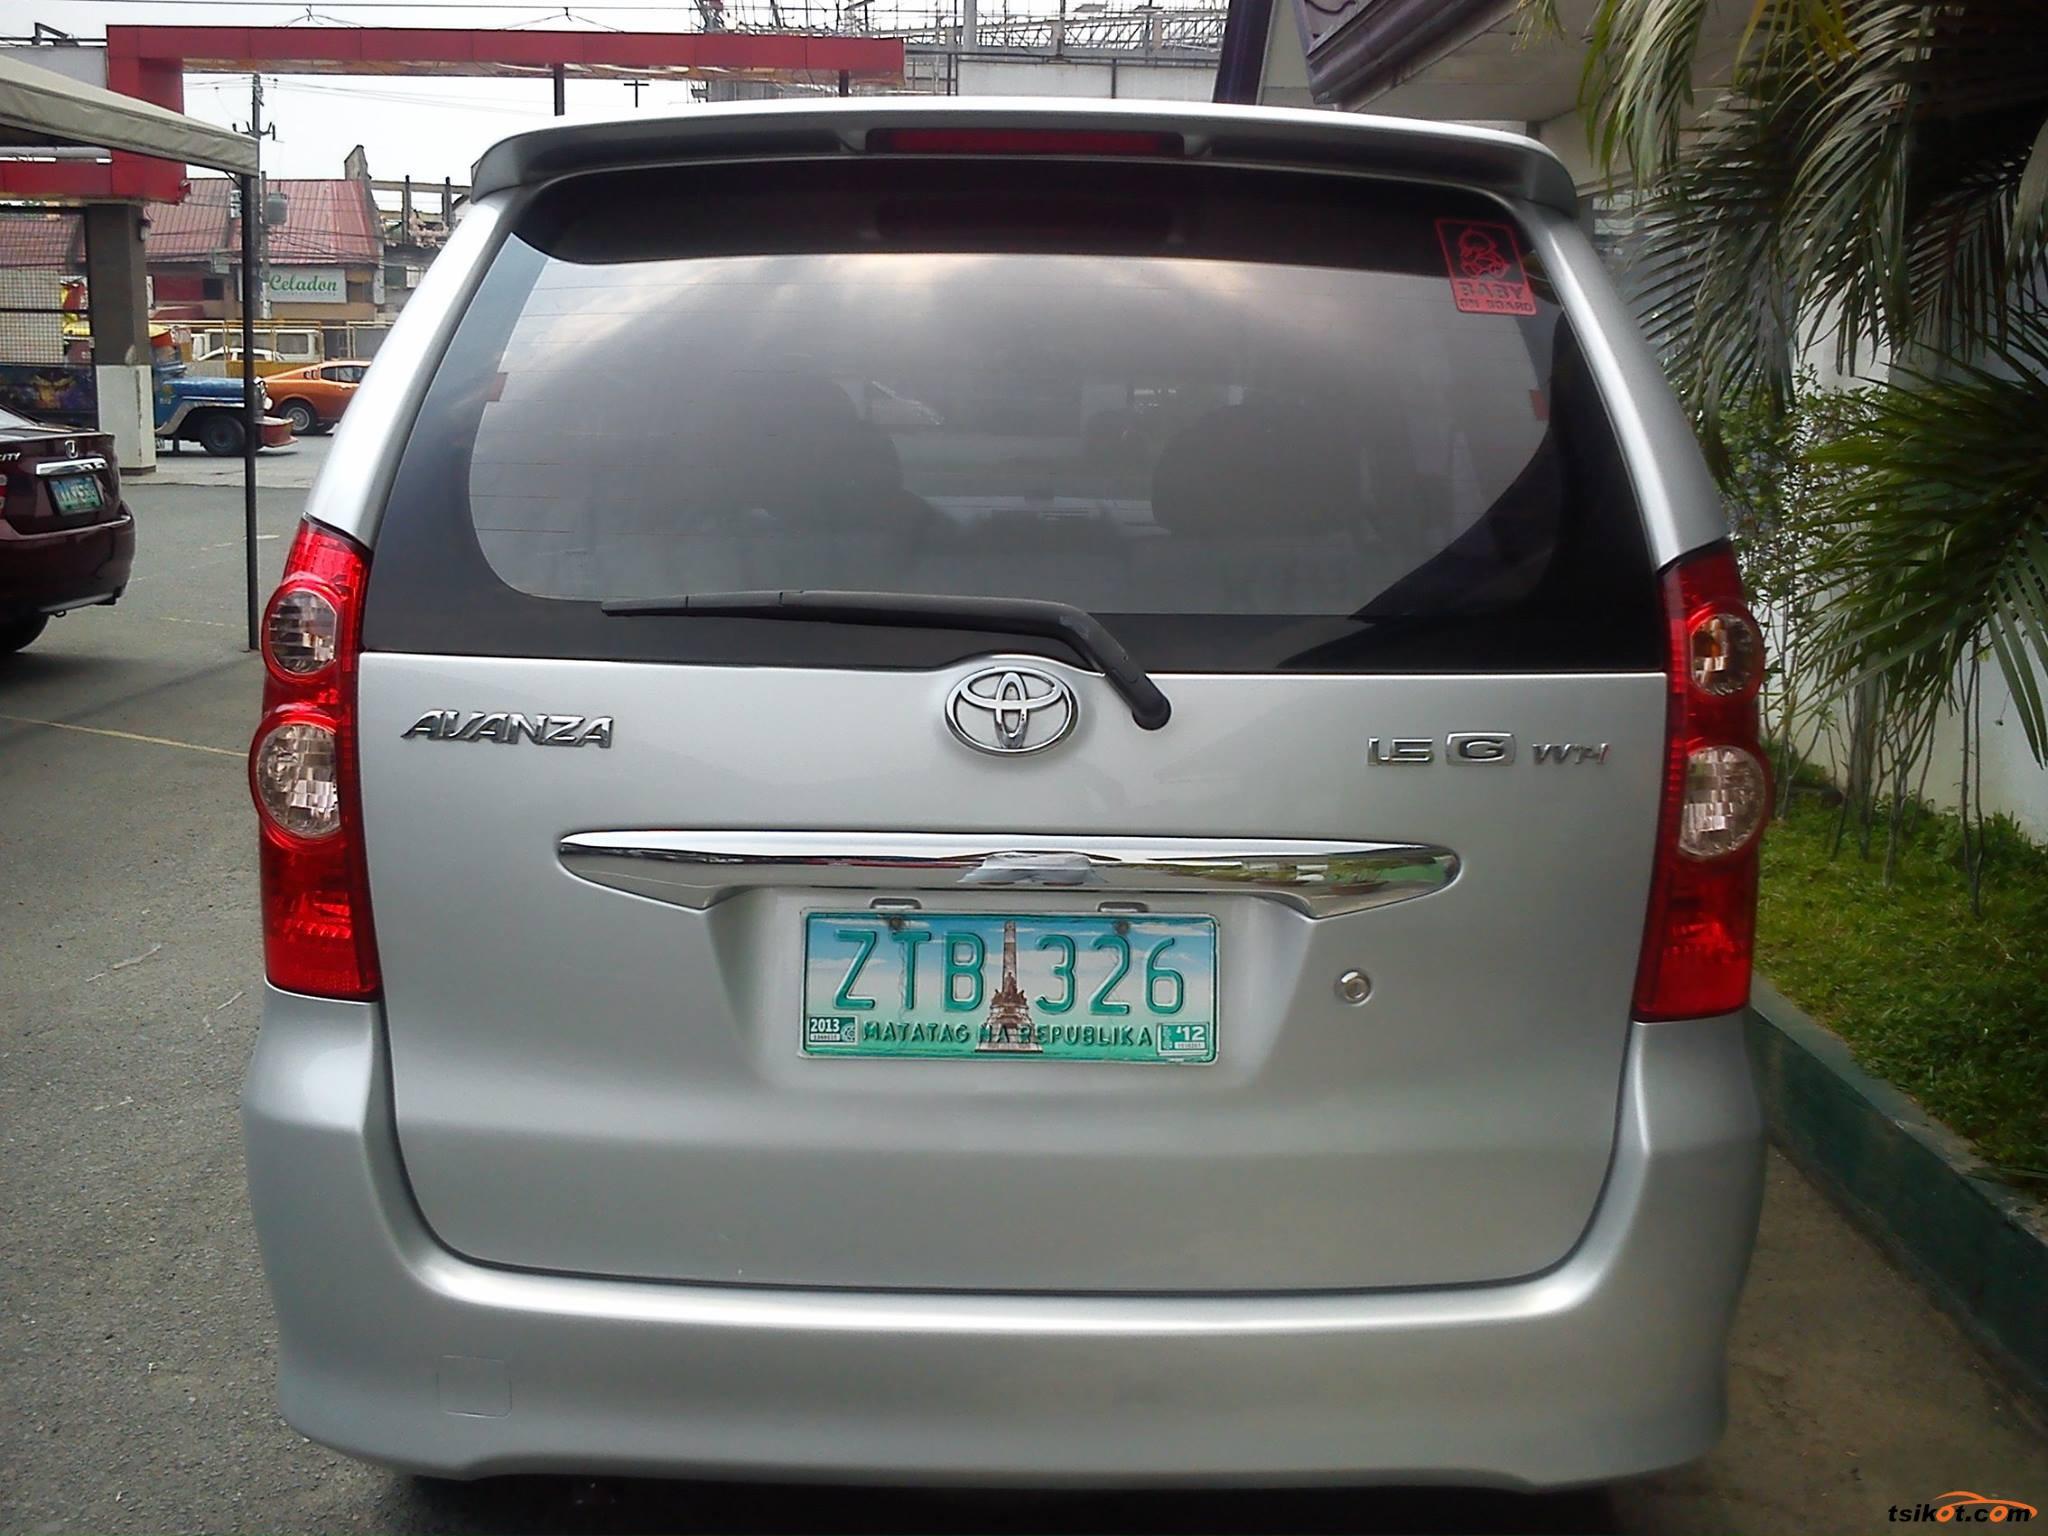 Toyota Avanza 2009 - 4